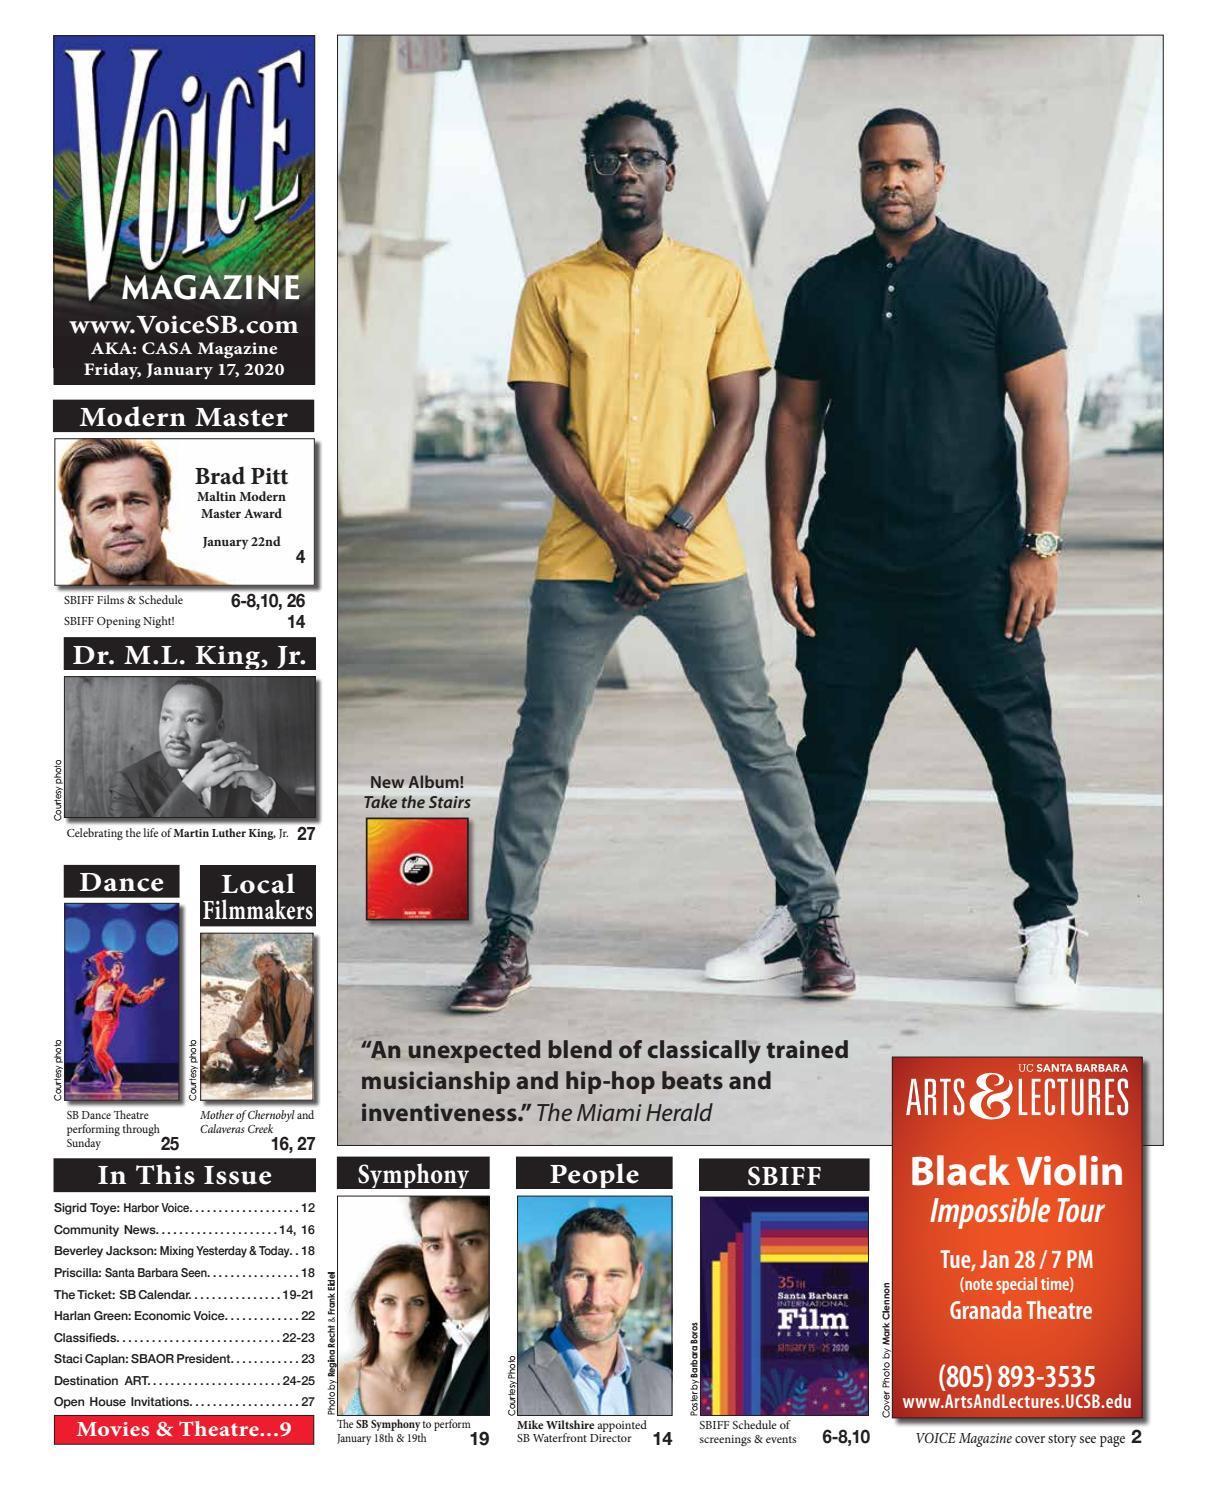 Alba Carrillo Altura voice magazine: january 17, 2020voice magazine / casa